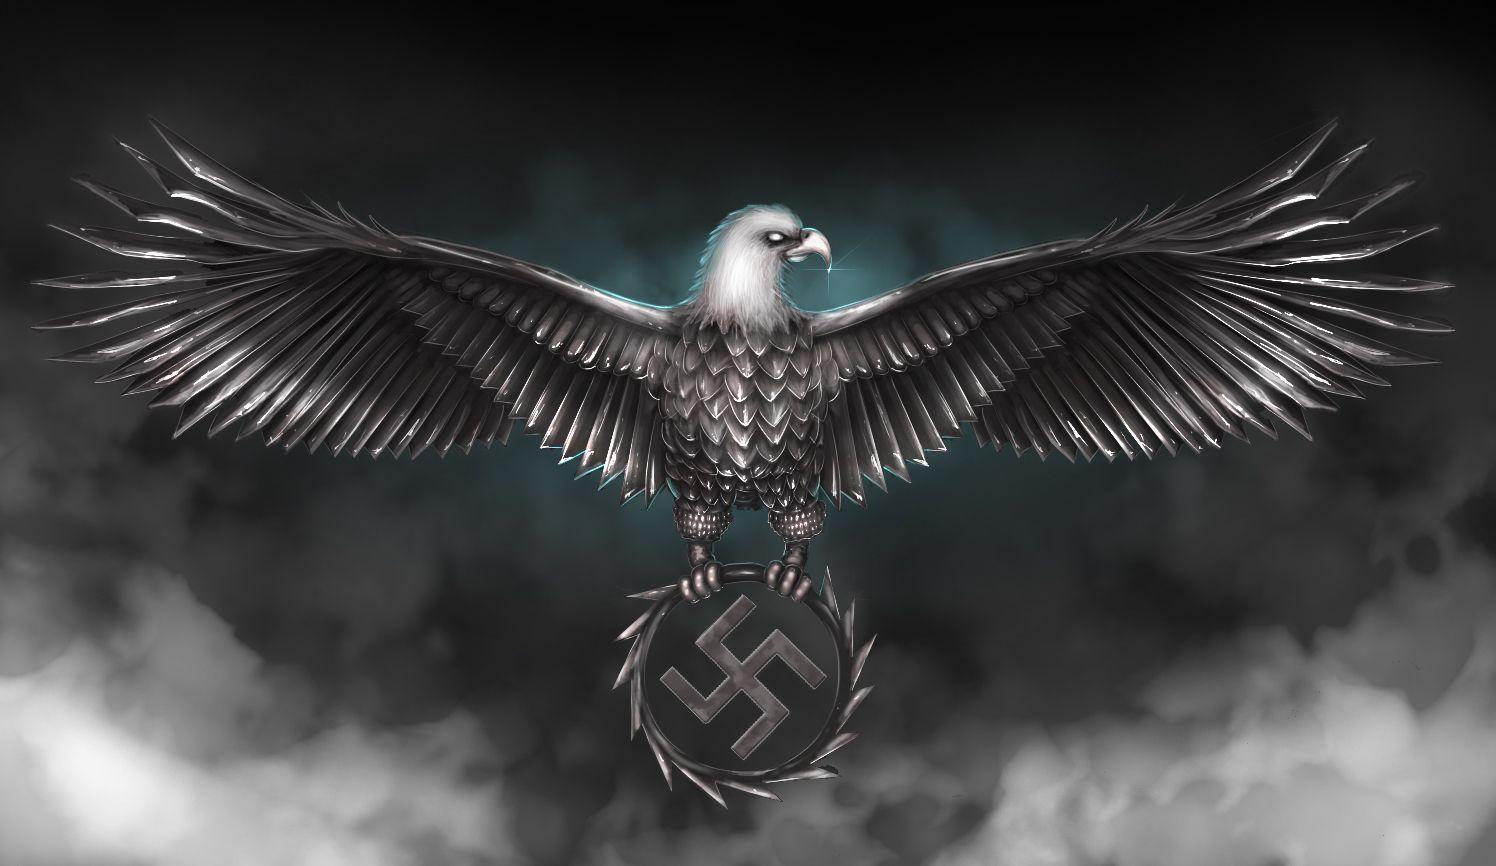 Iron eagle by d4rkharlequiniantart on deviantart churee iron eagle biocorpaavc Images